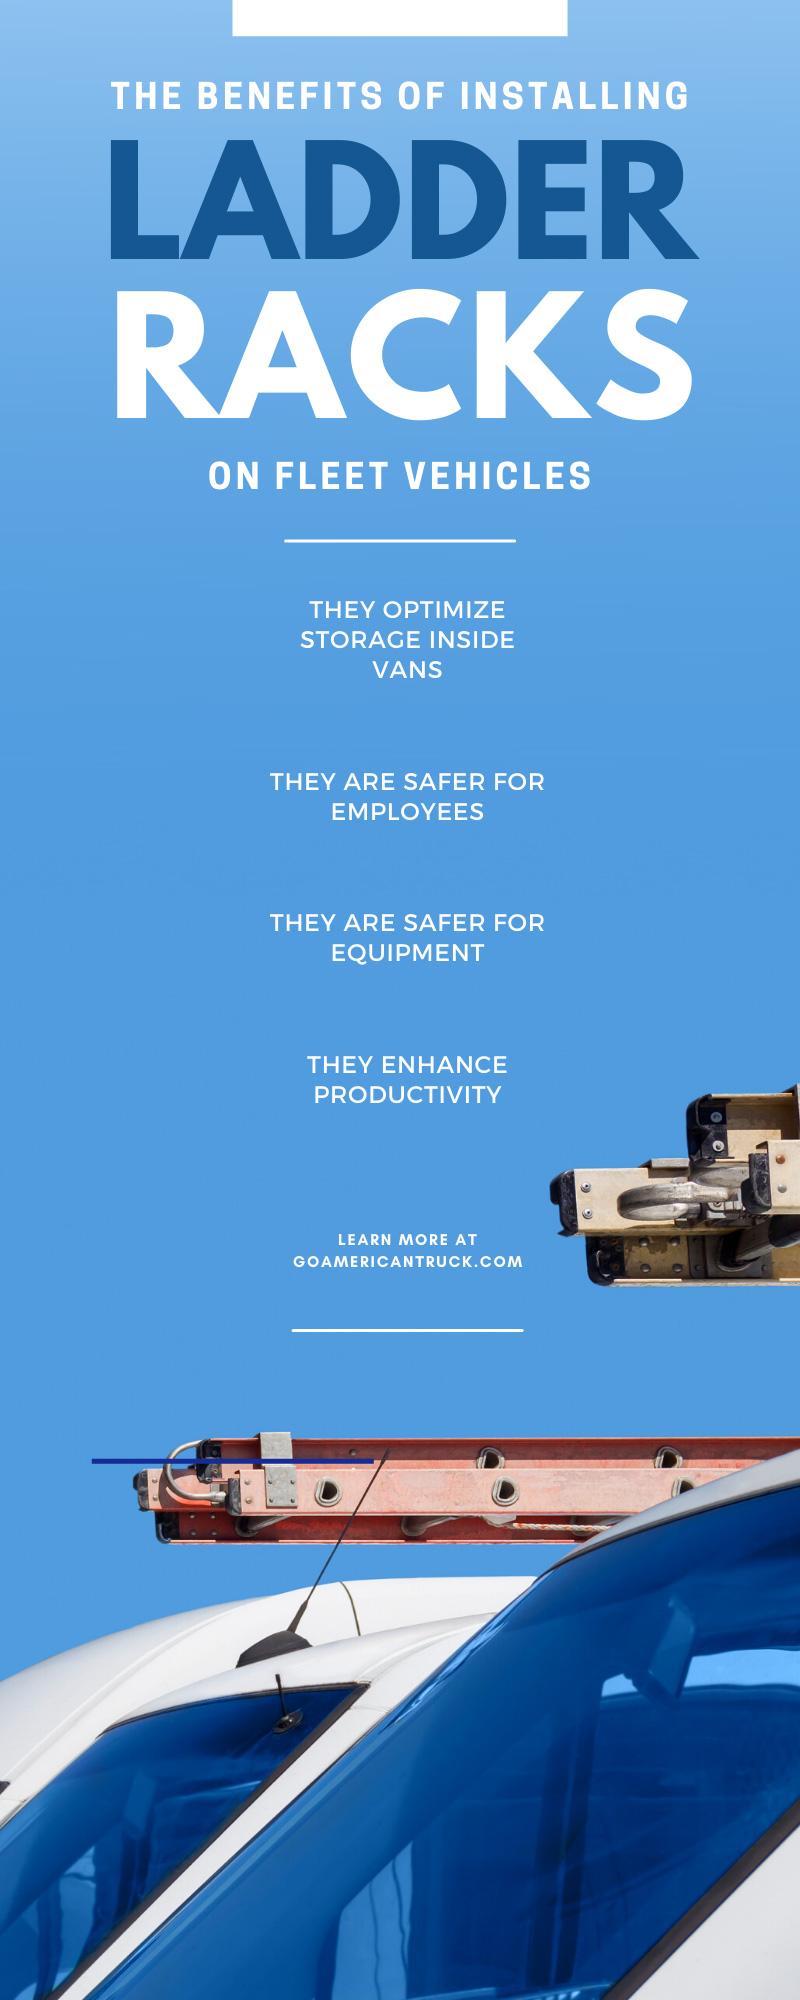 The Benefits of Installing Ladder Racks on Fleet Vehicles